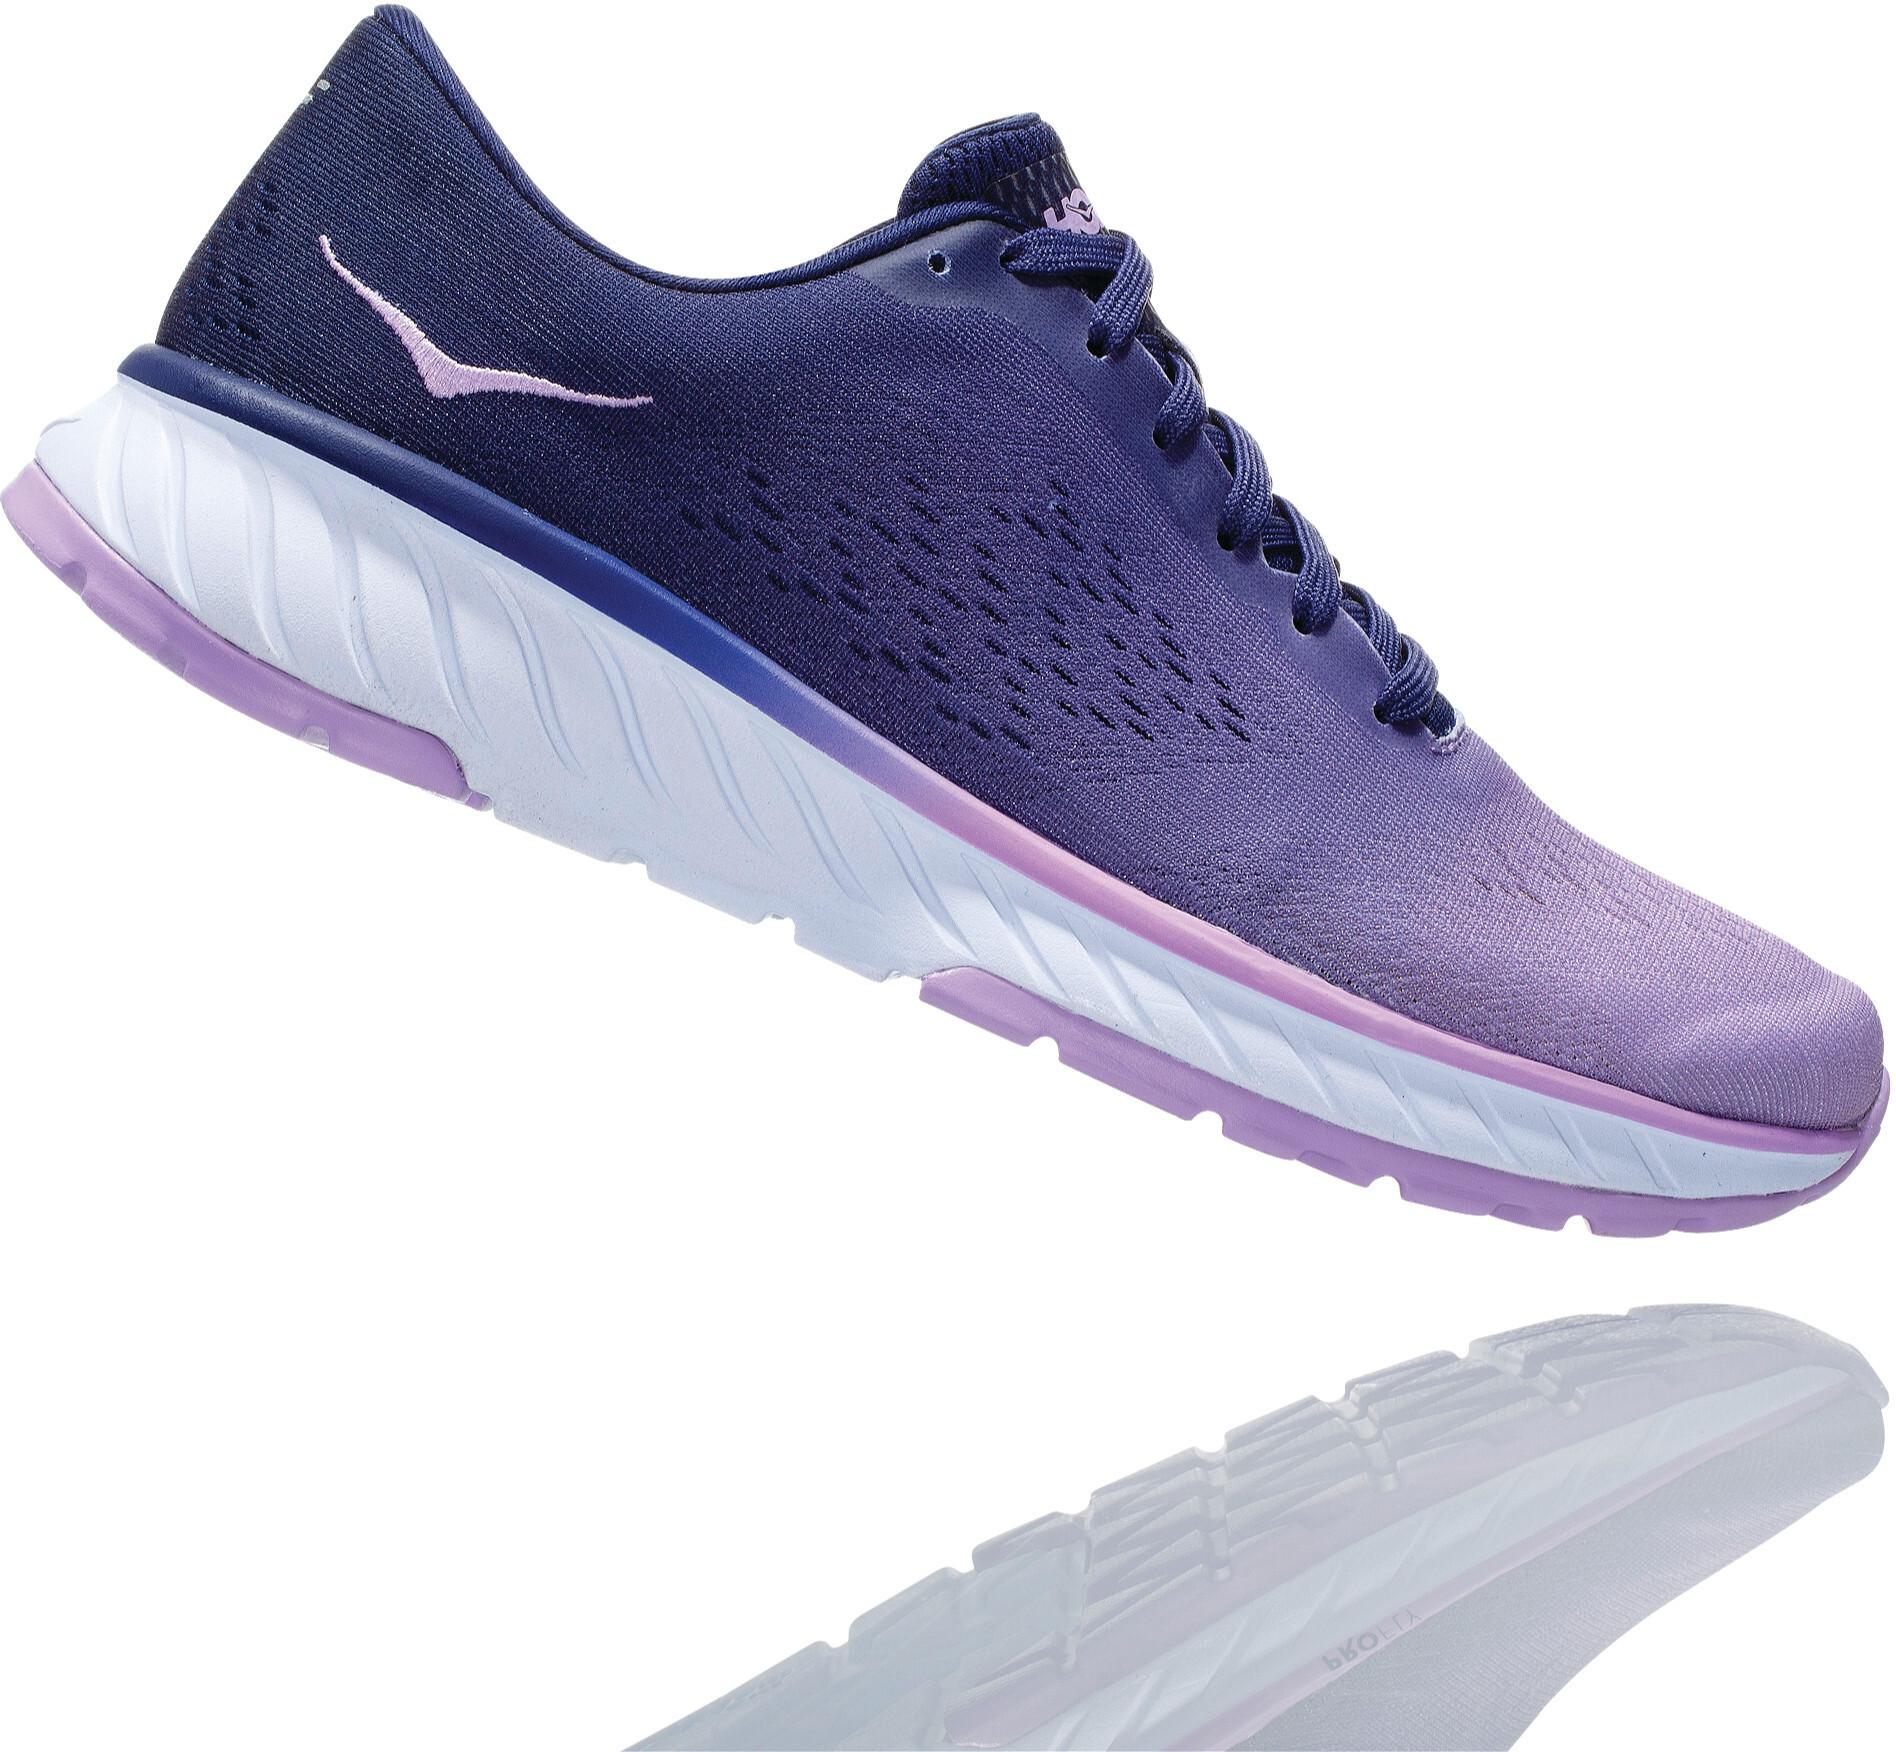 Hoka One One Cavu 2 Running Shoes Dame lavendulamedieval blue